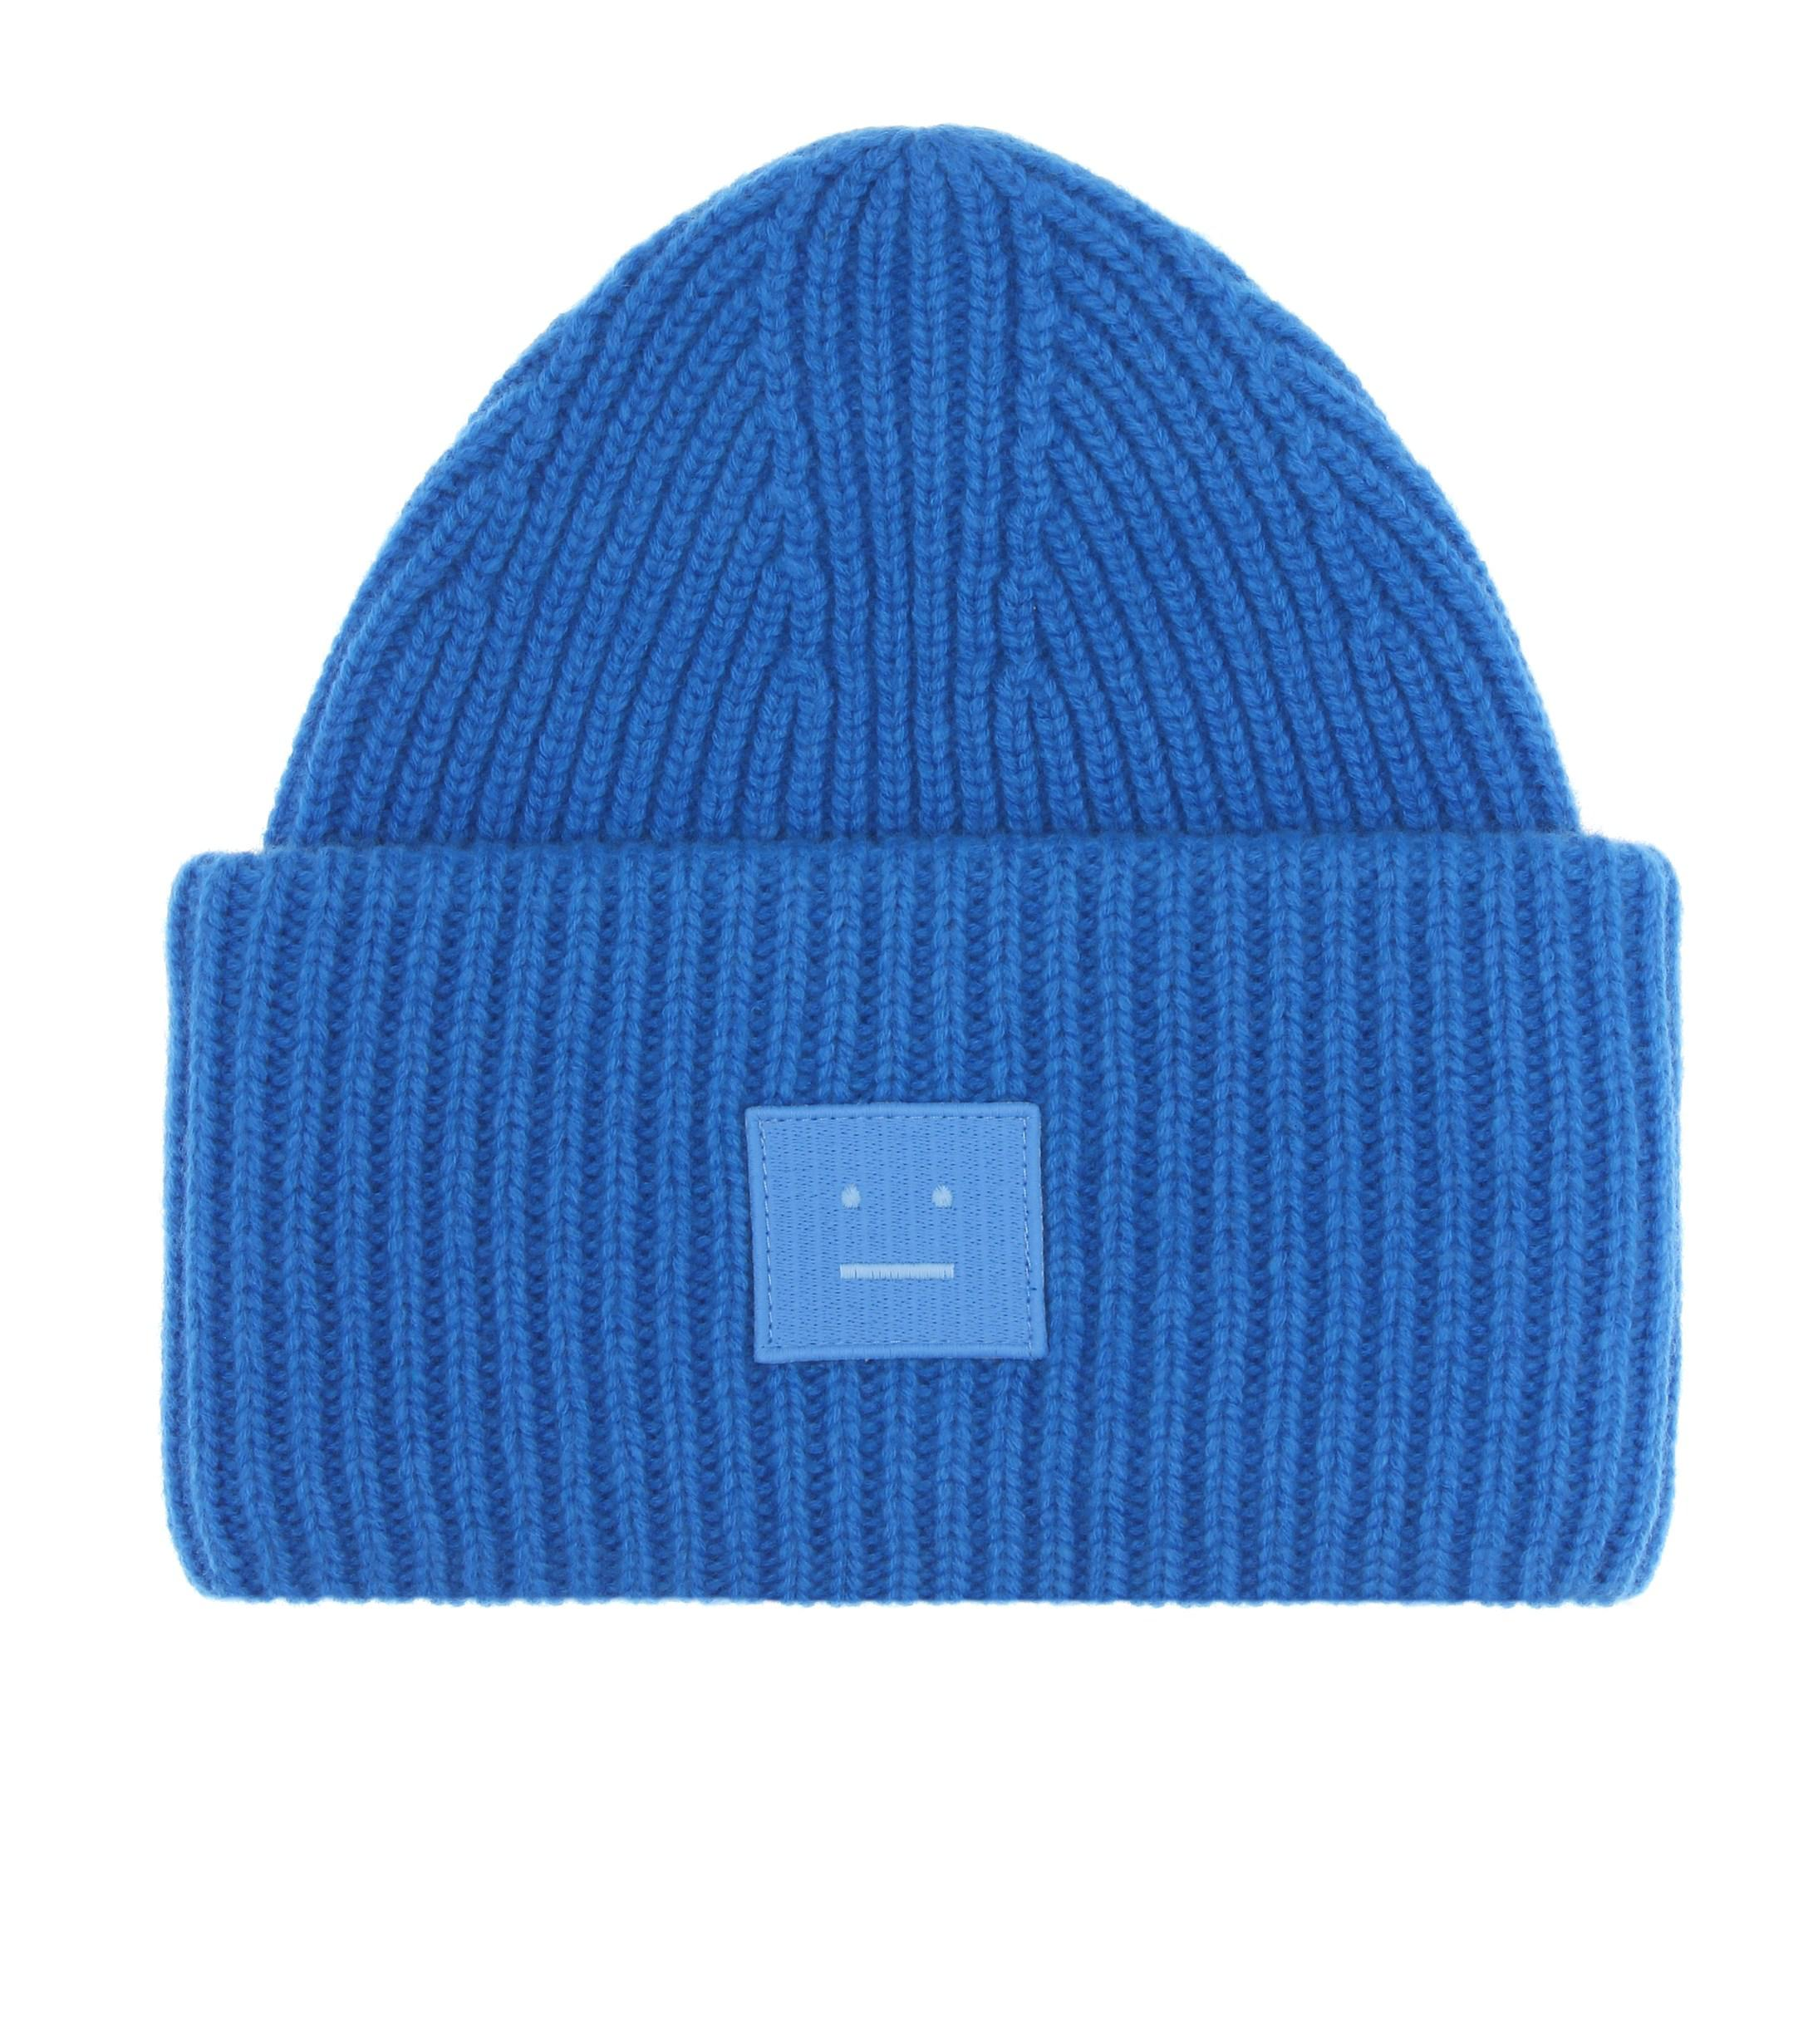 118a6f6cacb01f Acne Studios. Women's Blue Pansy N Face Wool Beanie